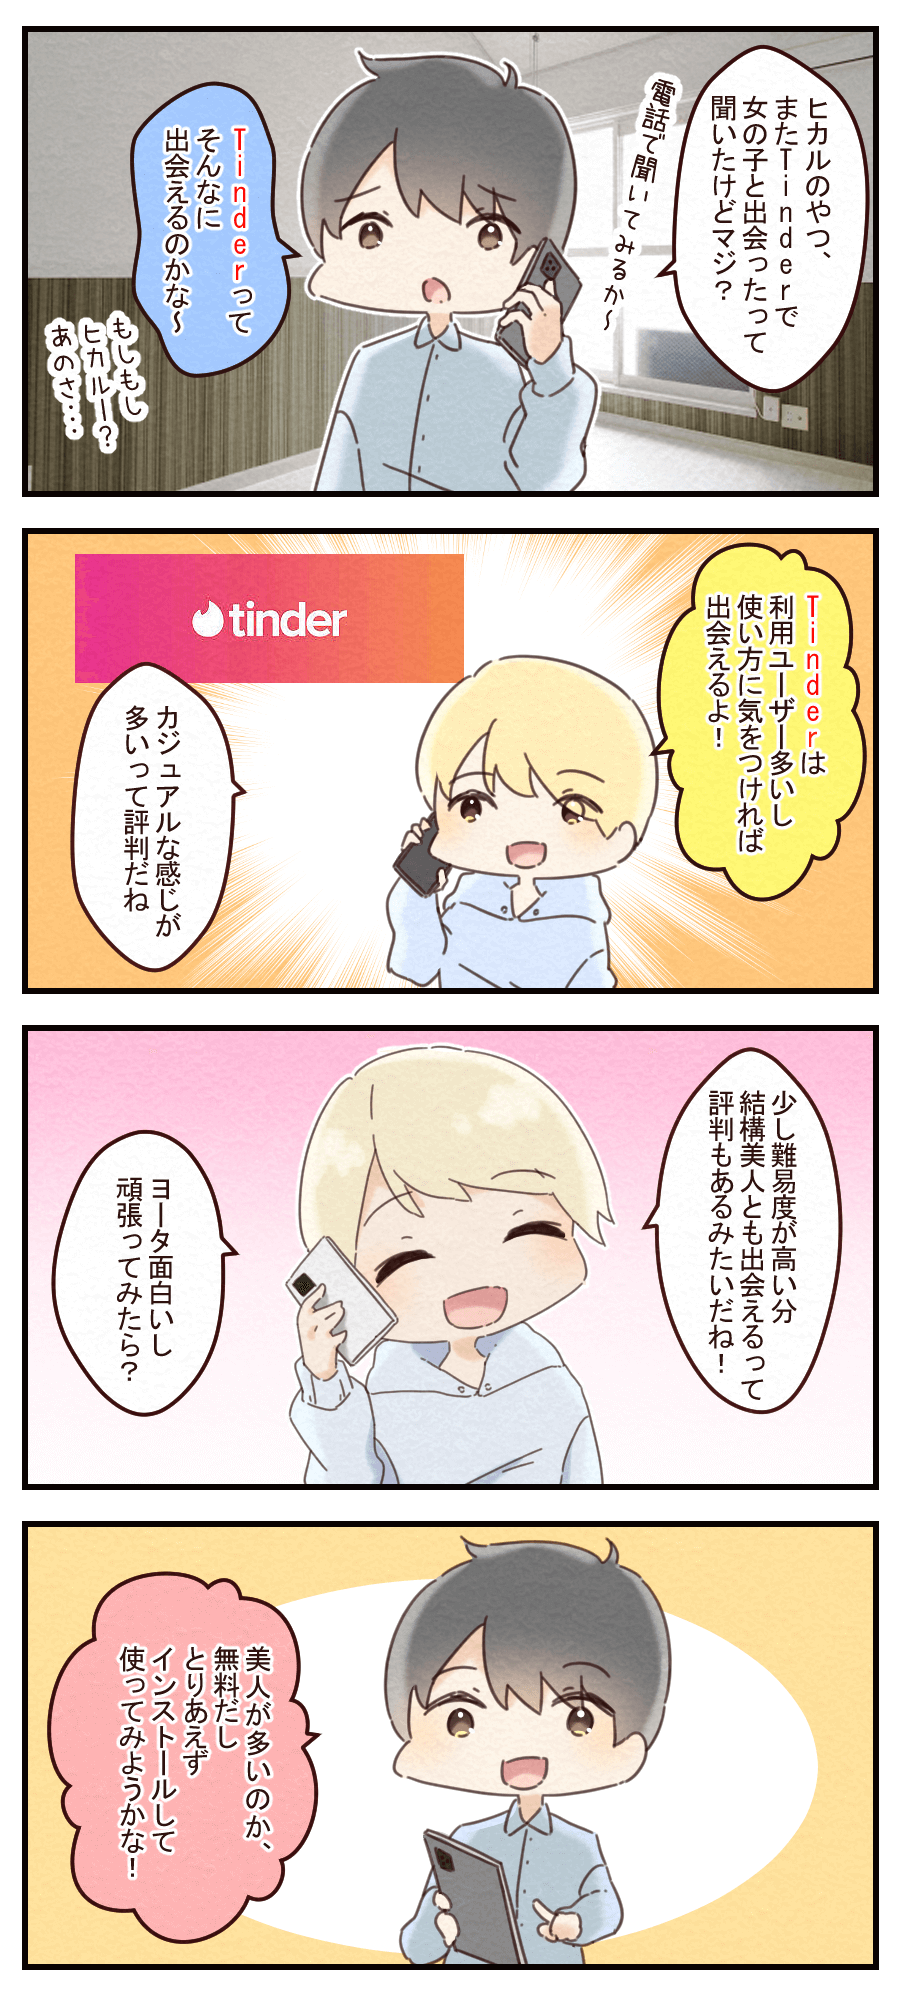 tinder評判